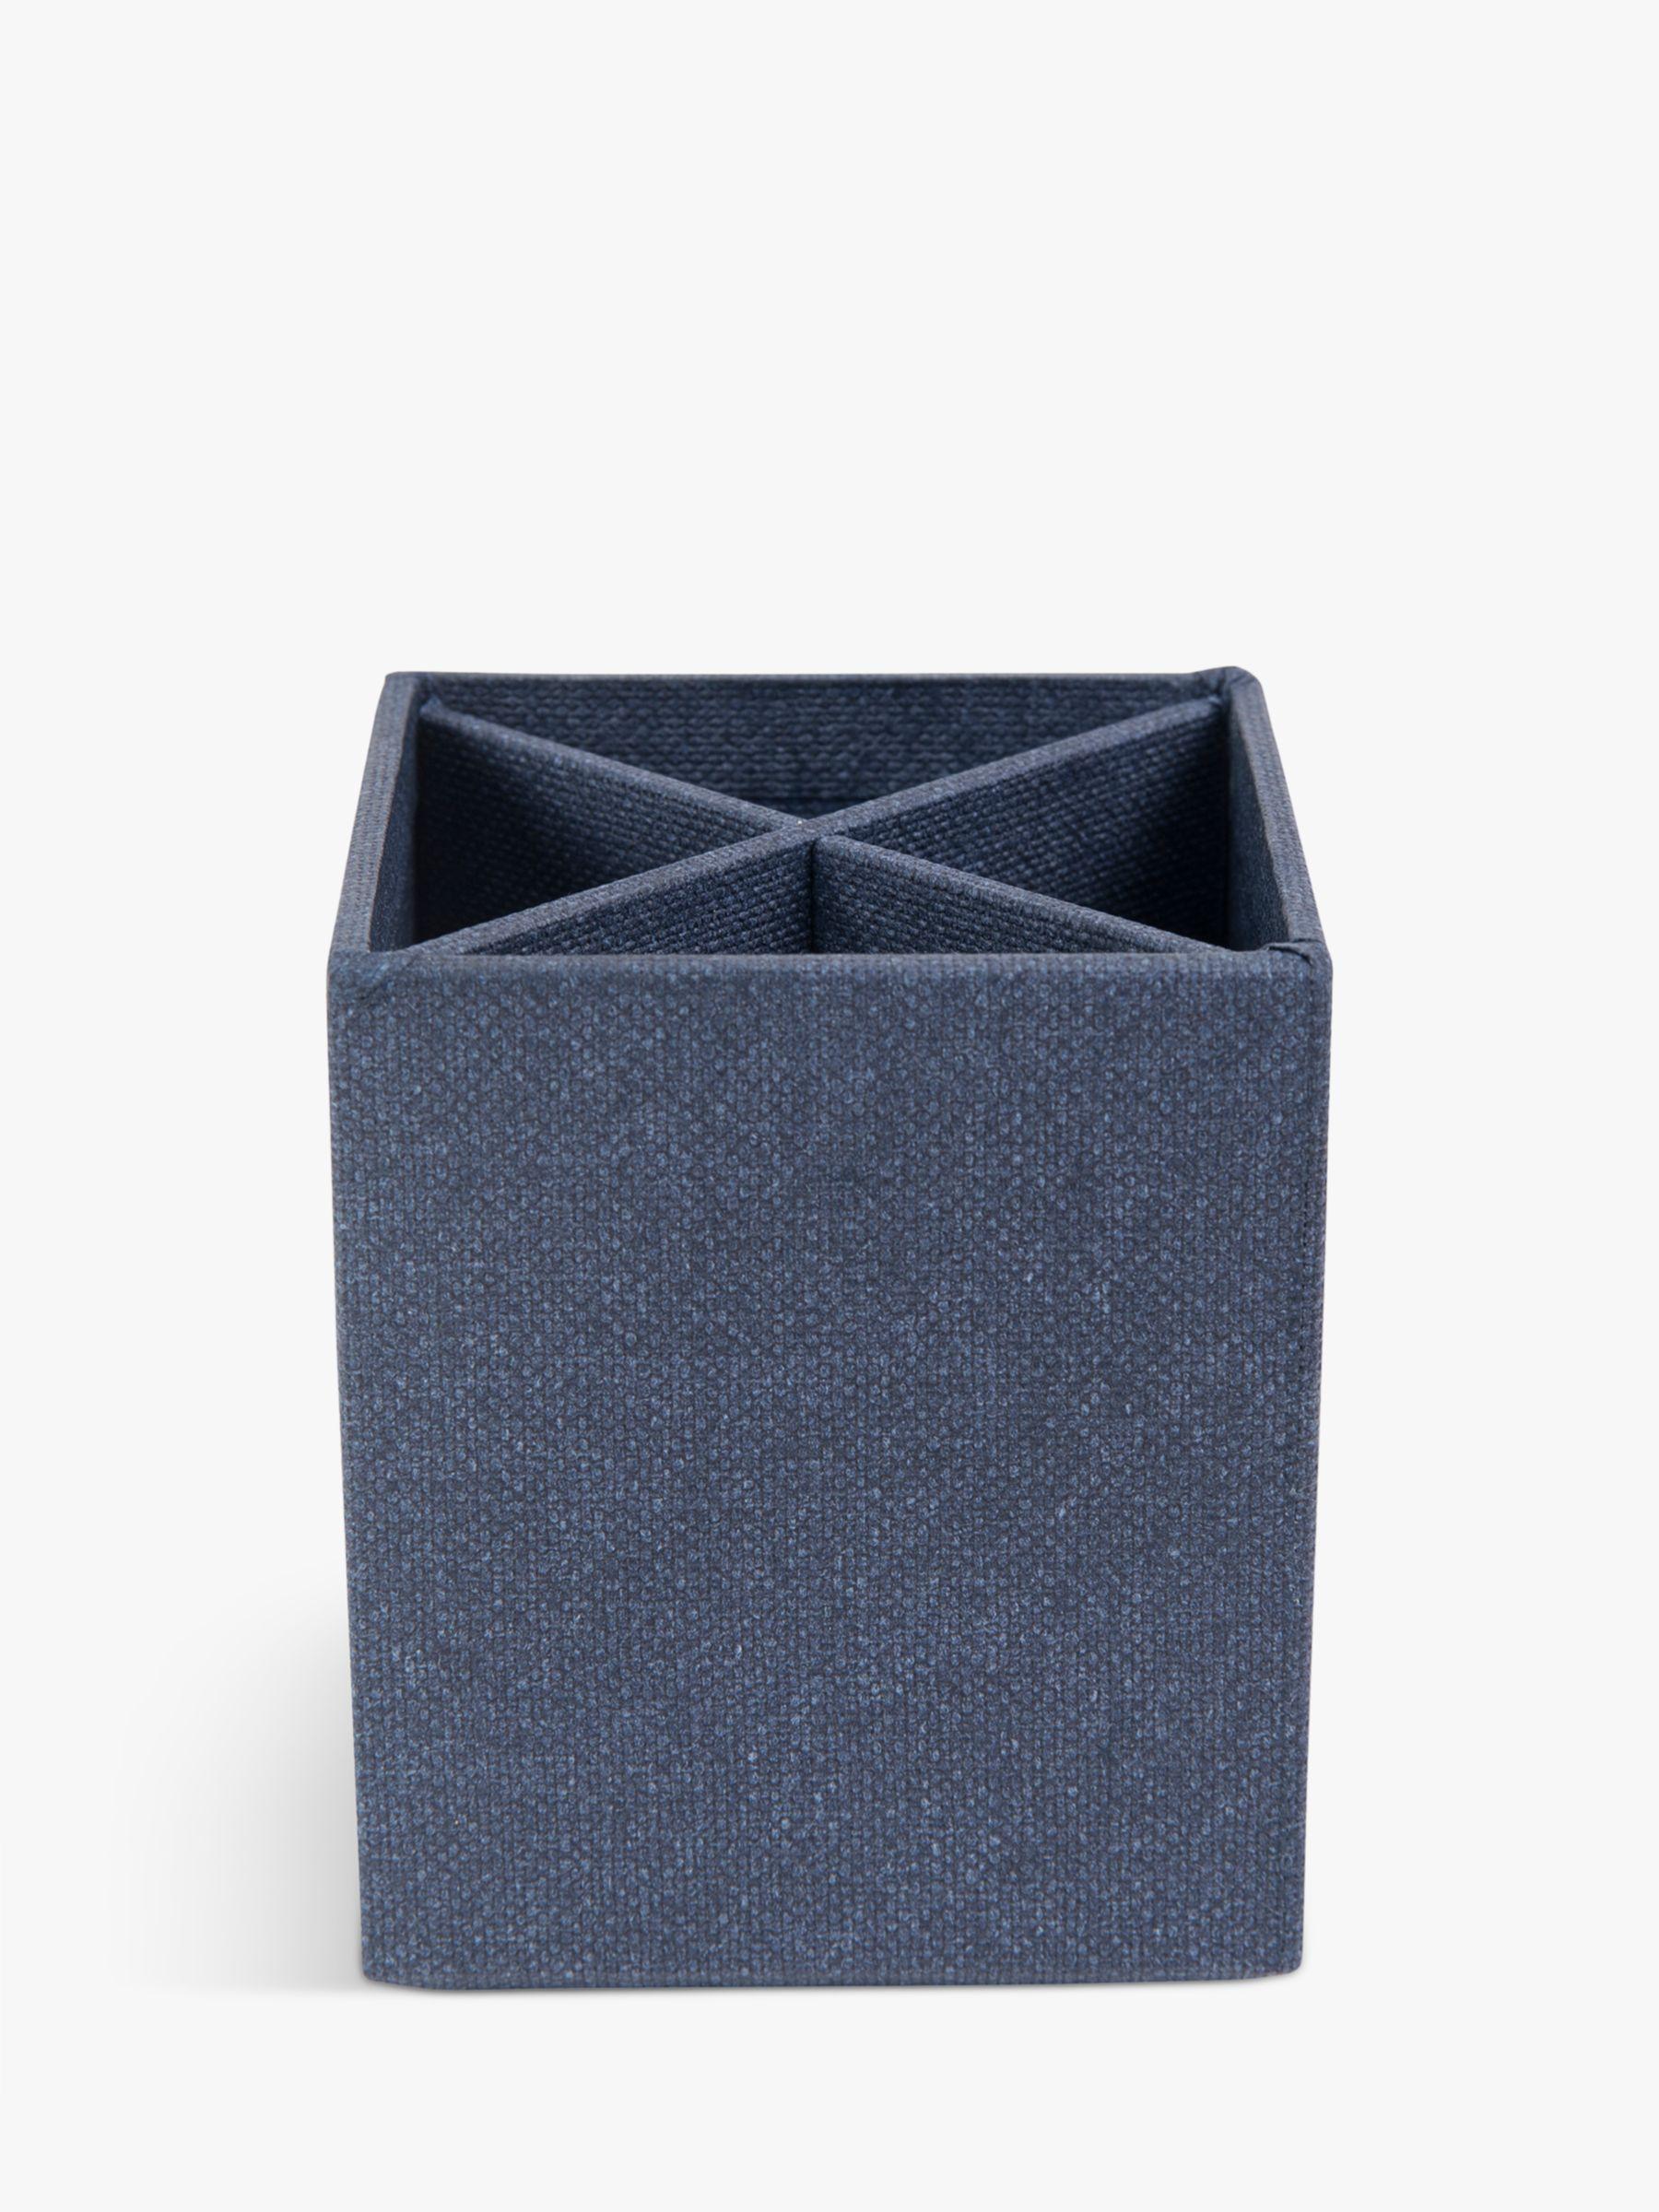 Bigso Box Of Sweden Canvas Pencil Pot